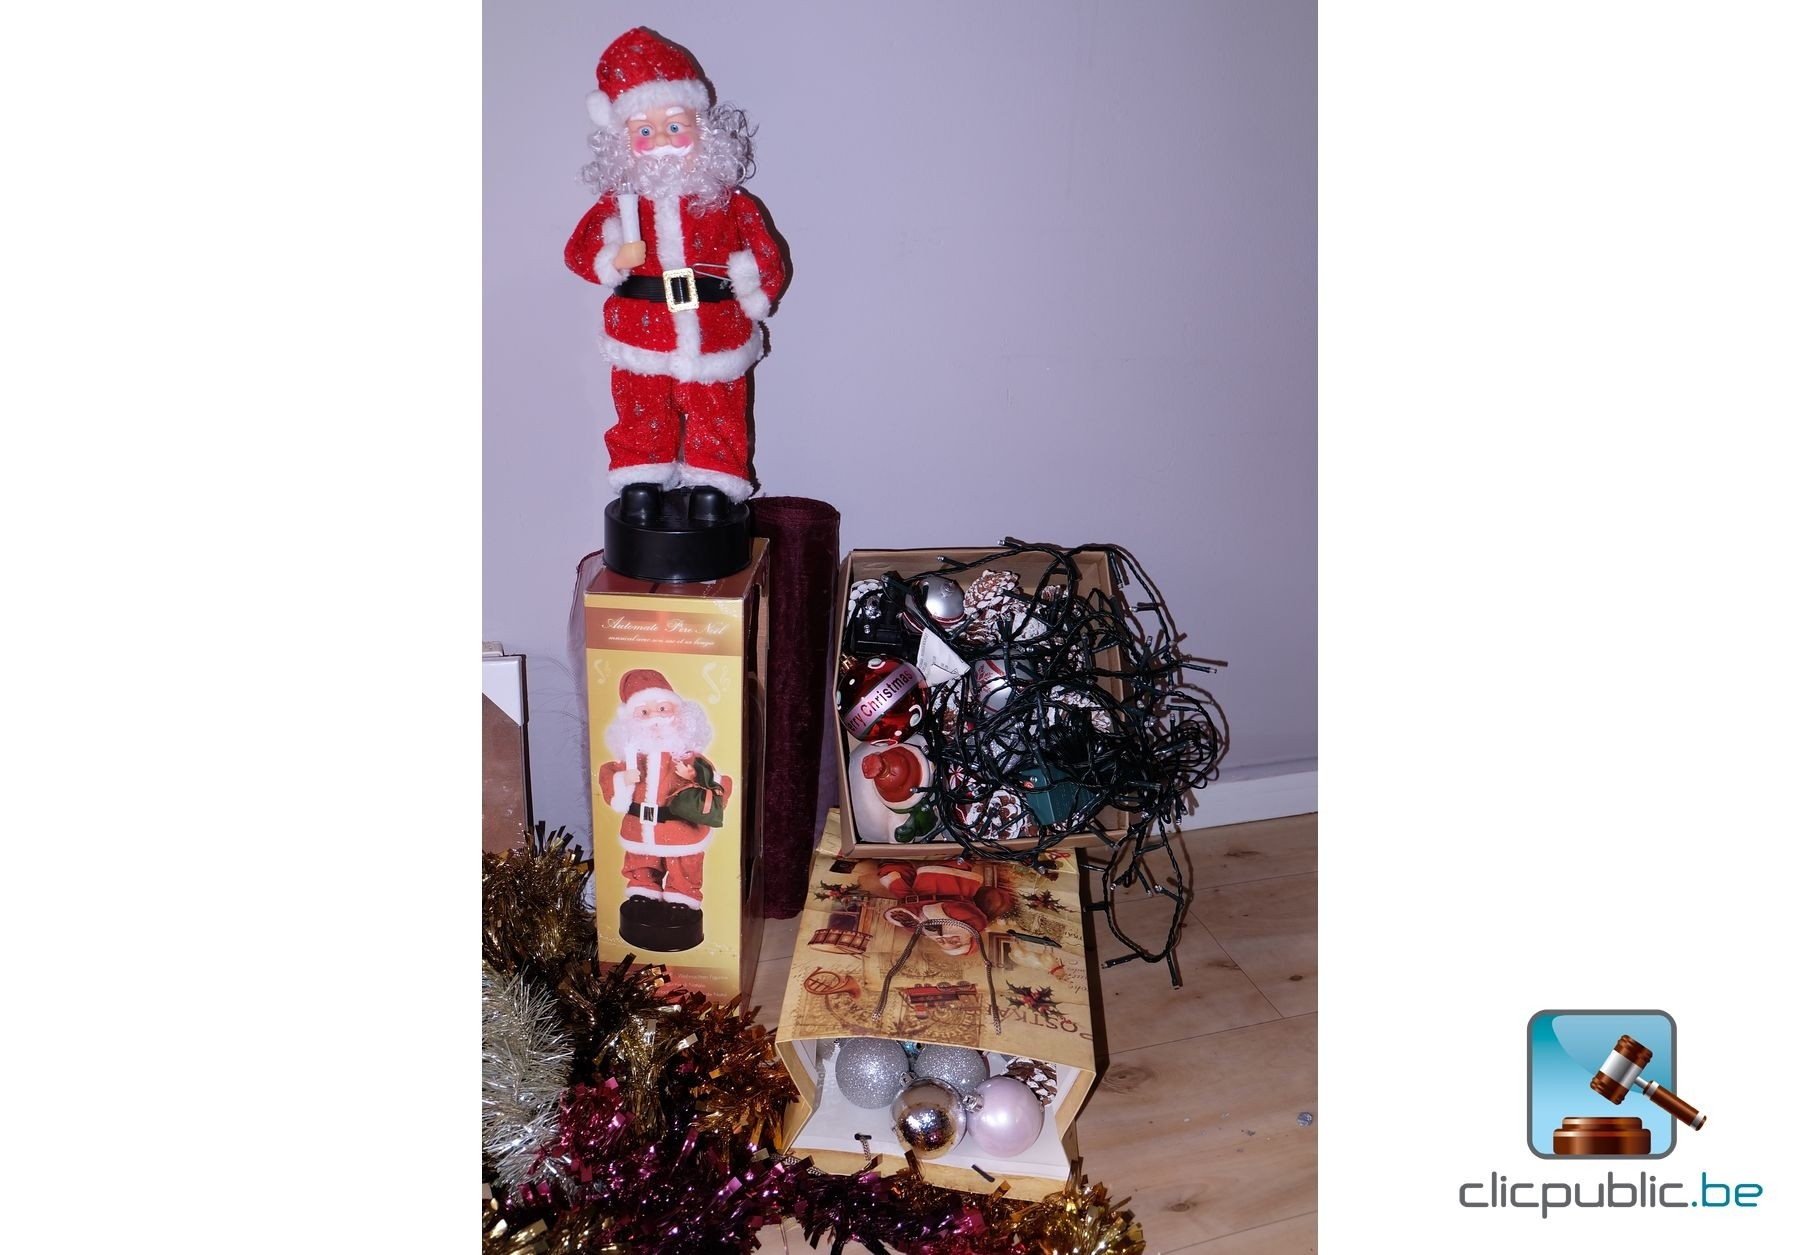 #B41727 Décorations De Noël (ref. 6) à Vendre Sur Clicpublic.be 5319 decorations de noel a vendre 1800x1255 px @ aertt.com